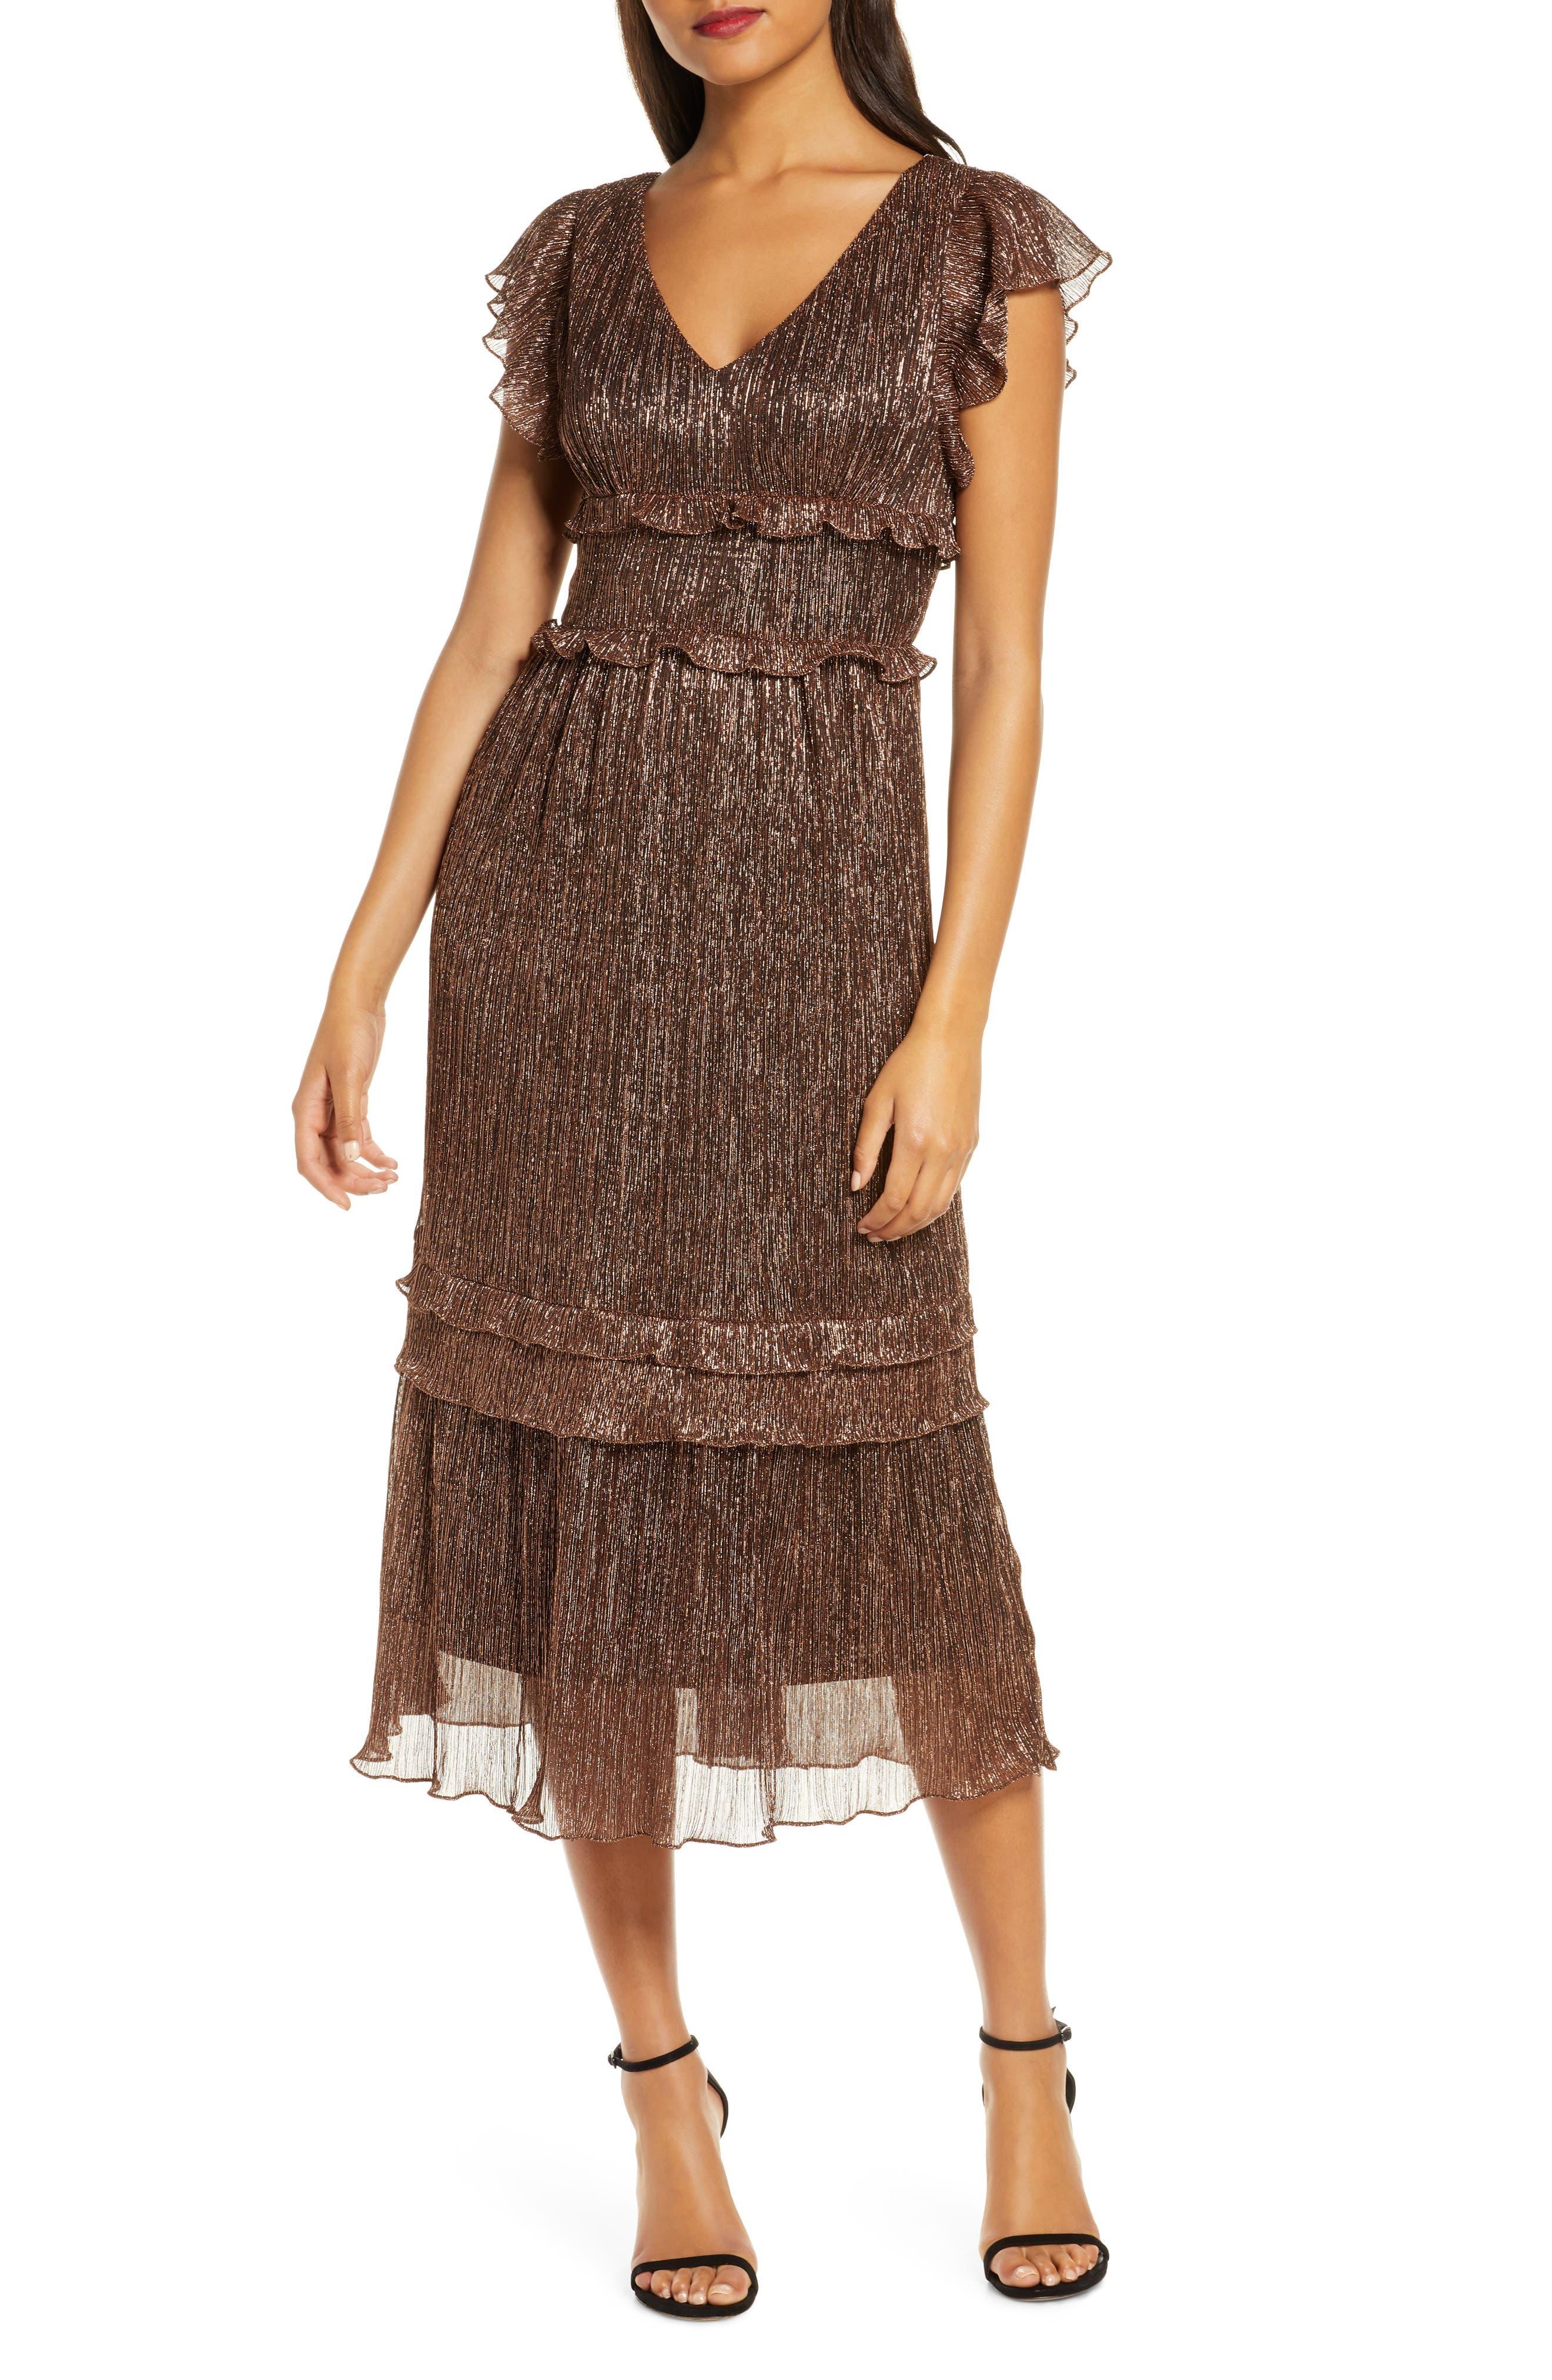 1920s Evening Dresses & Formal Gowns Womens Julia Jordan Metallic Ruffle Trim Midi Dress $77.40 AT vintagedancer.com